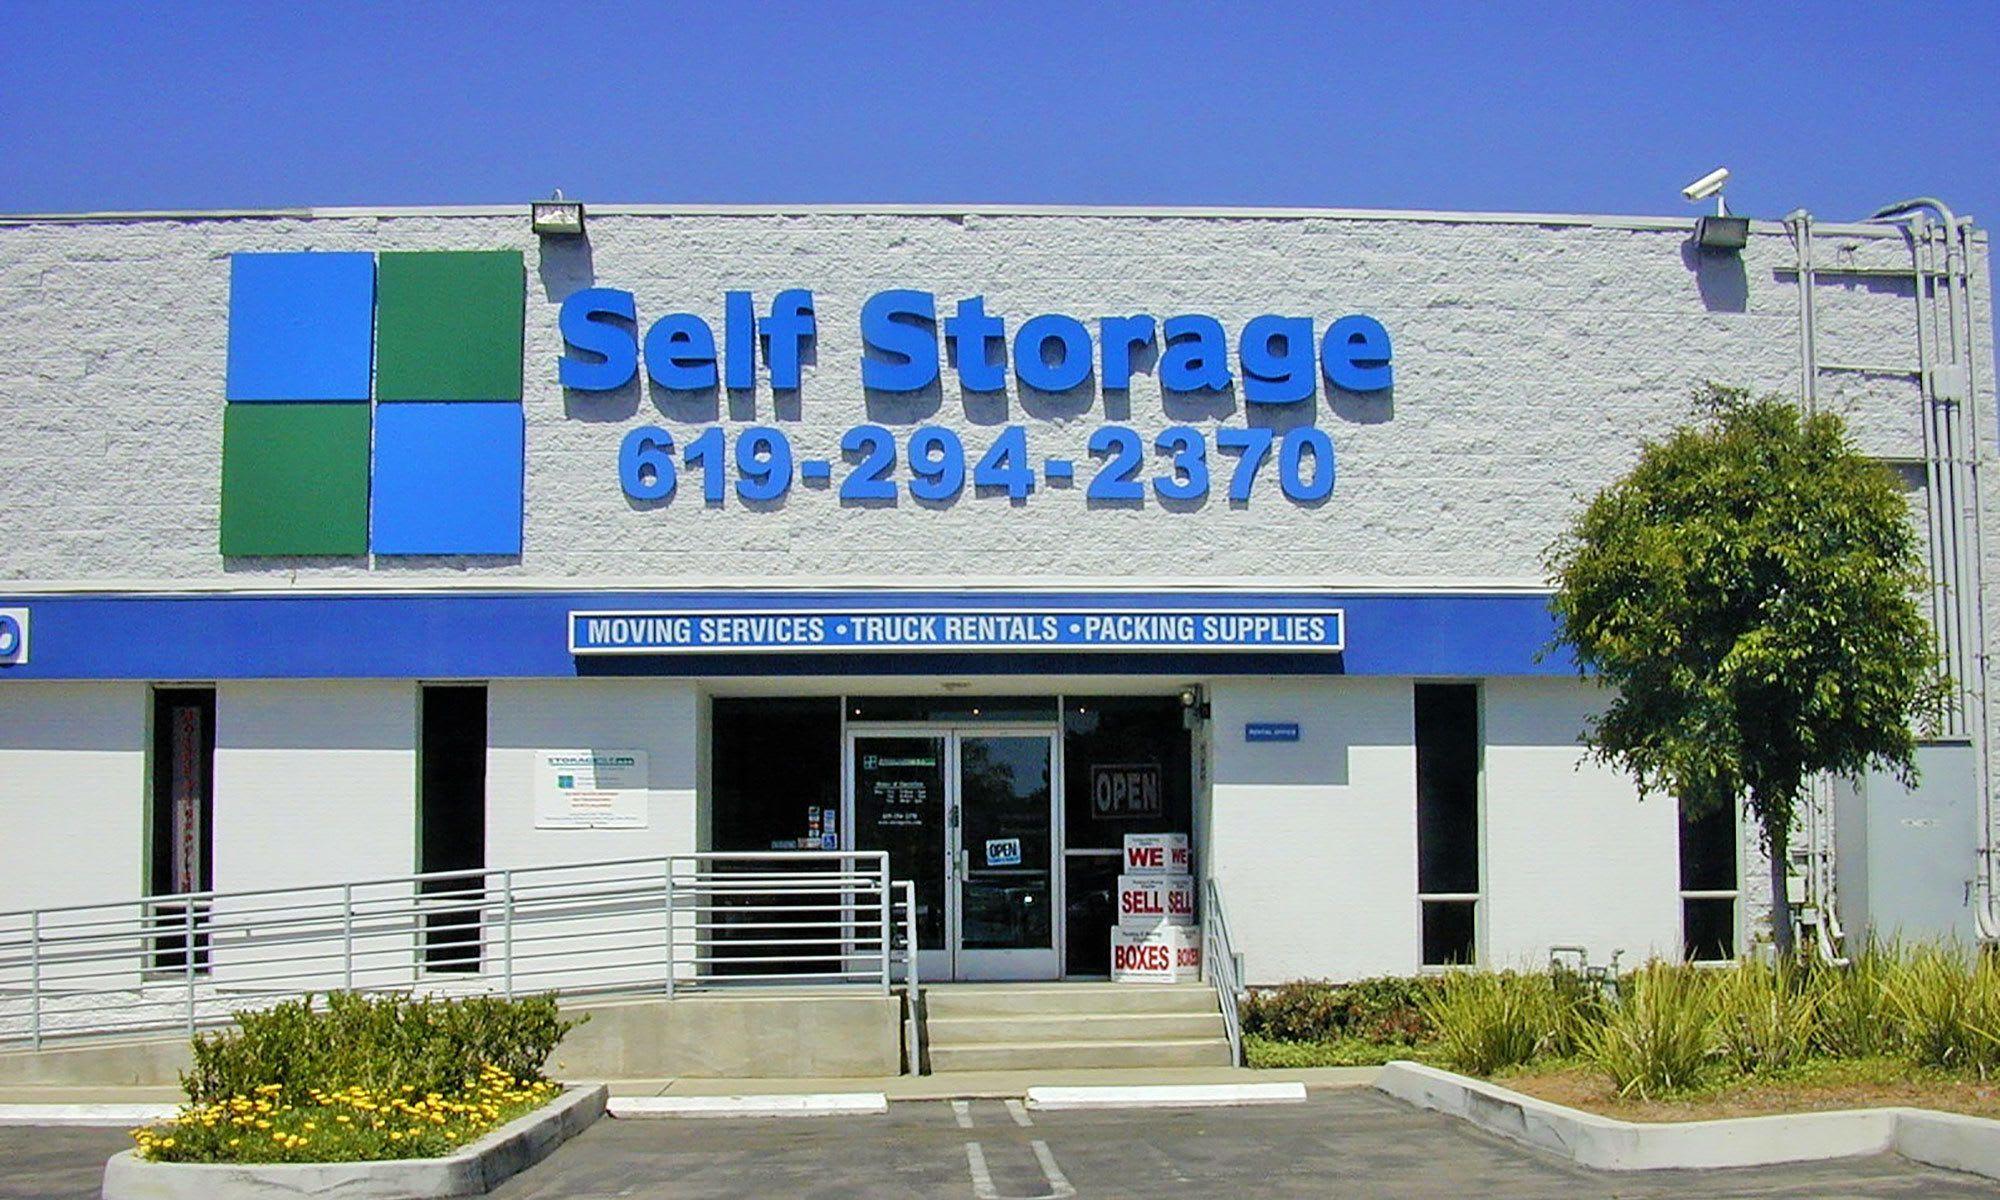 Self storage in San Diego CA